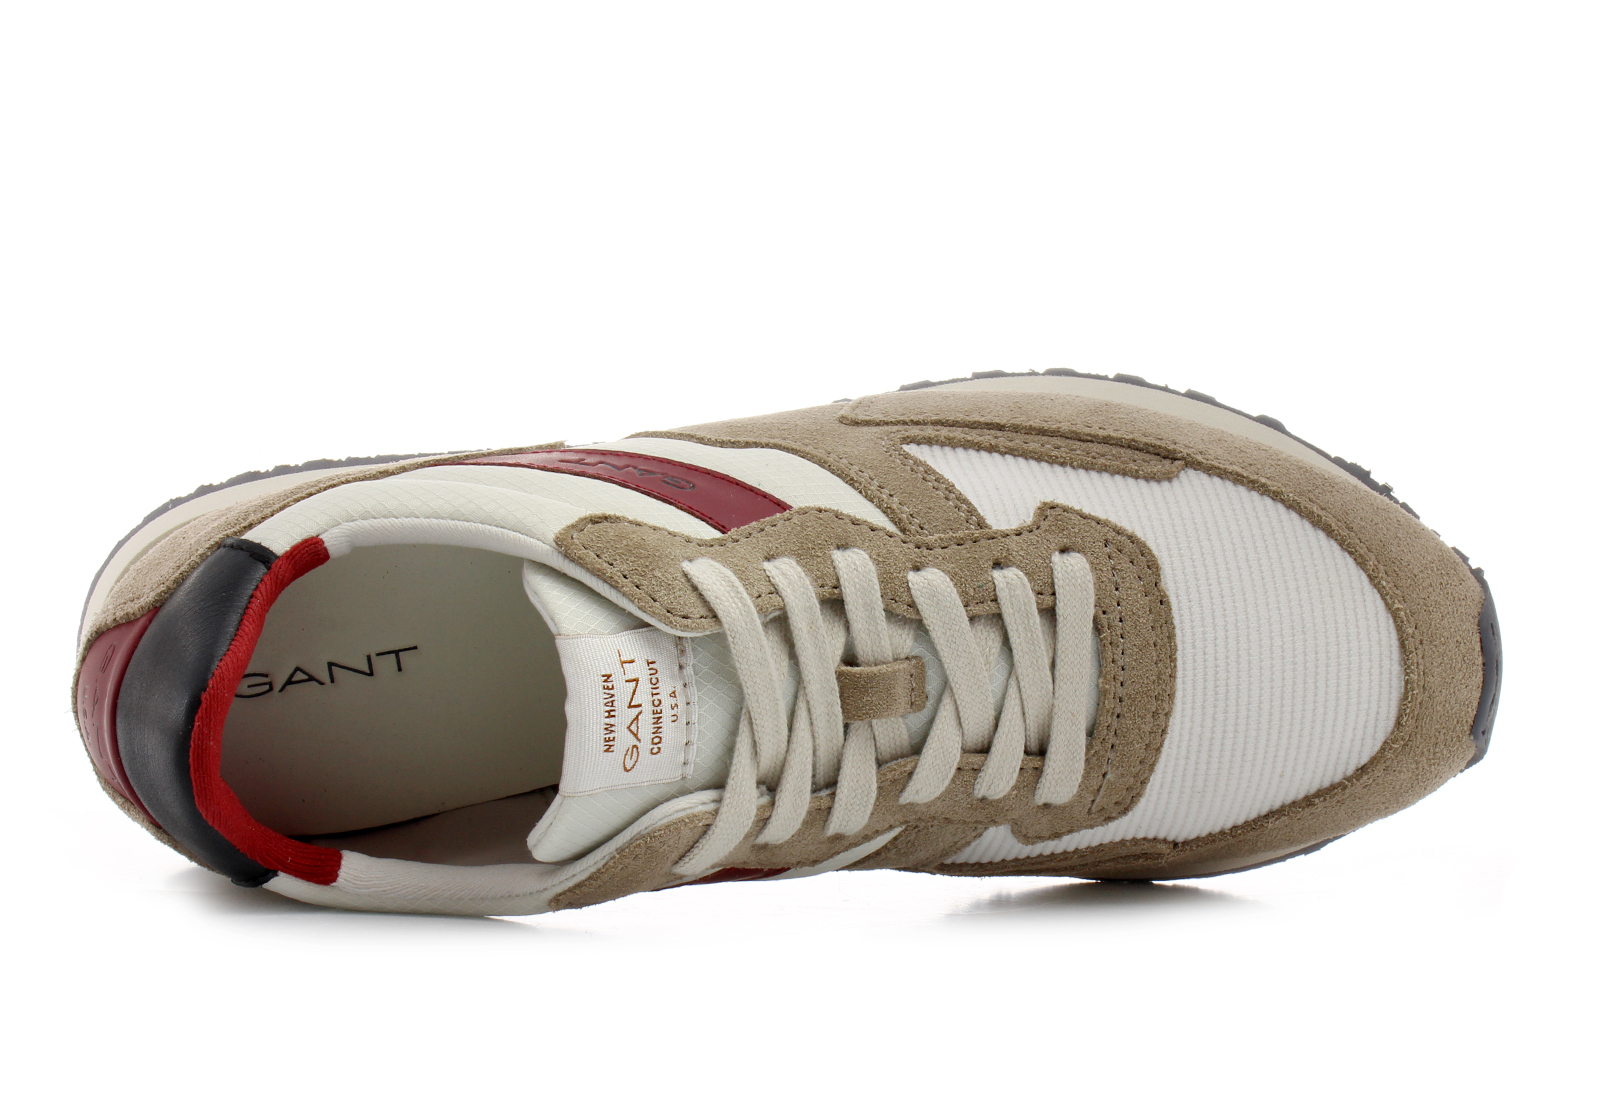 Gant Cipő - Duke - 16639529-G440 - Office Shoes Magyarország bf23045655